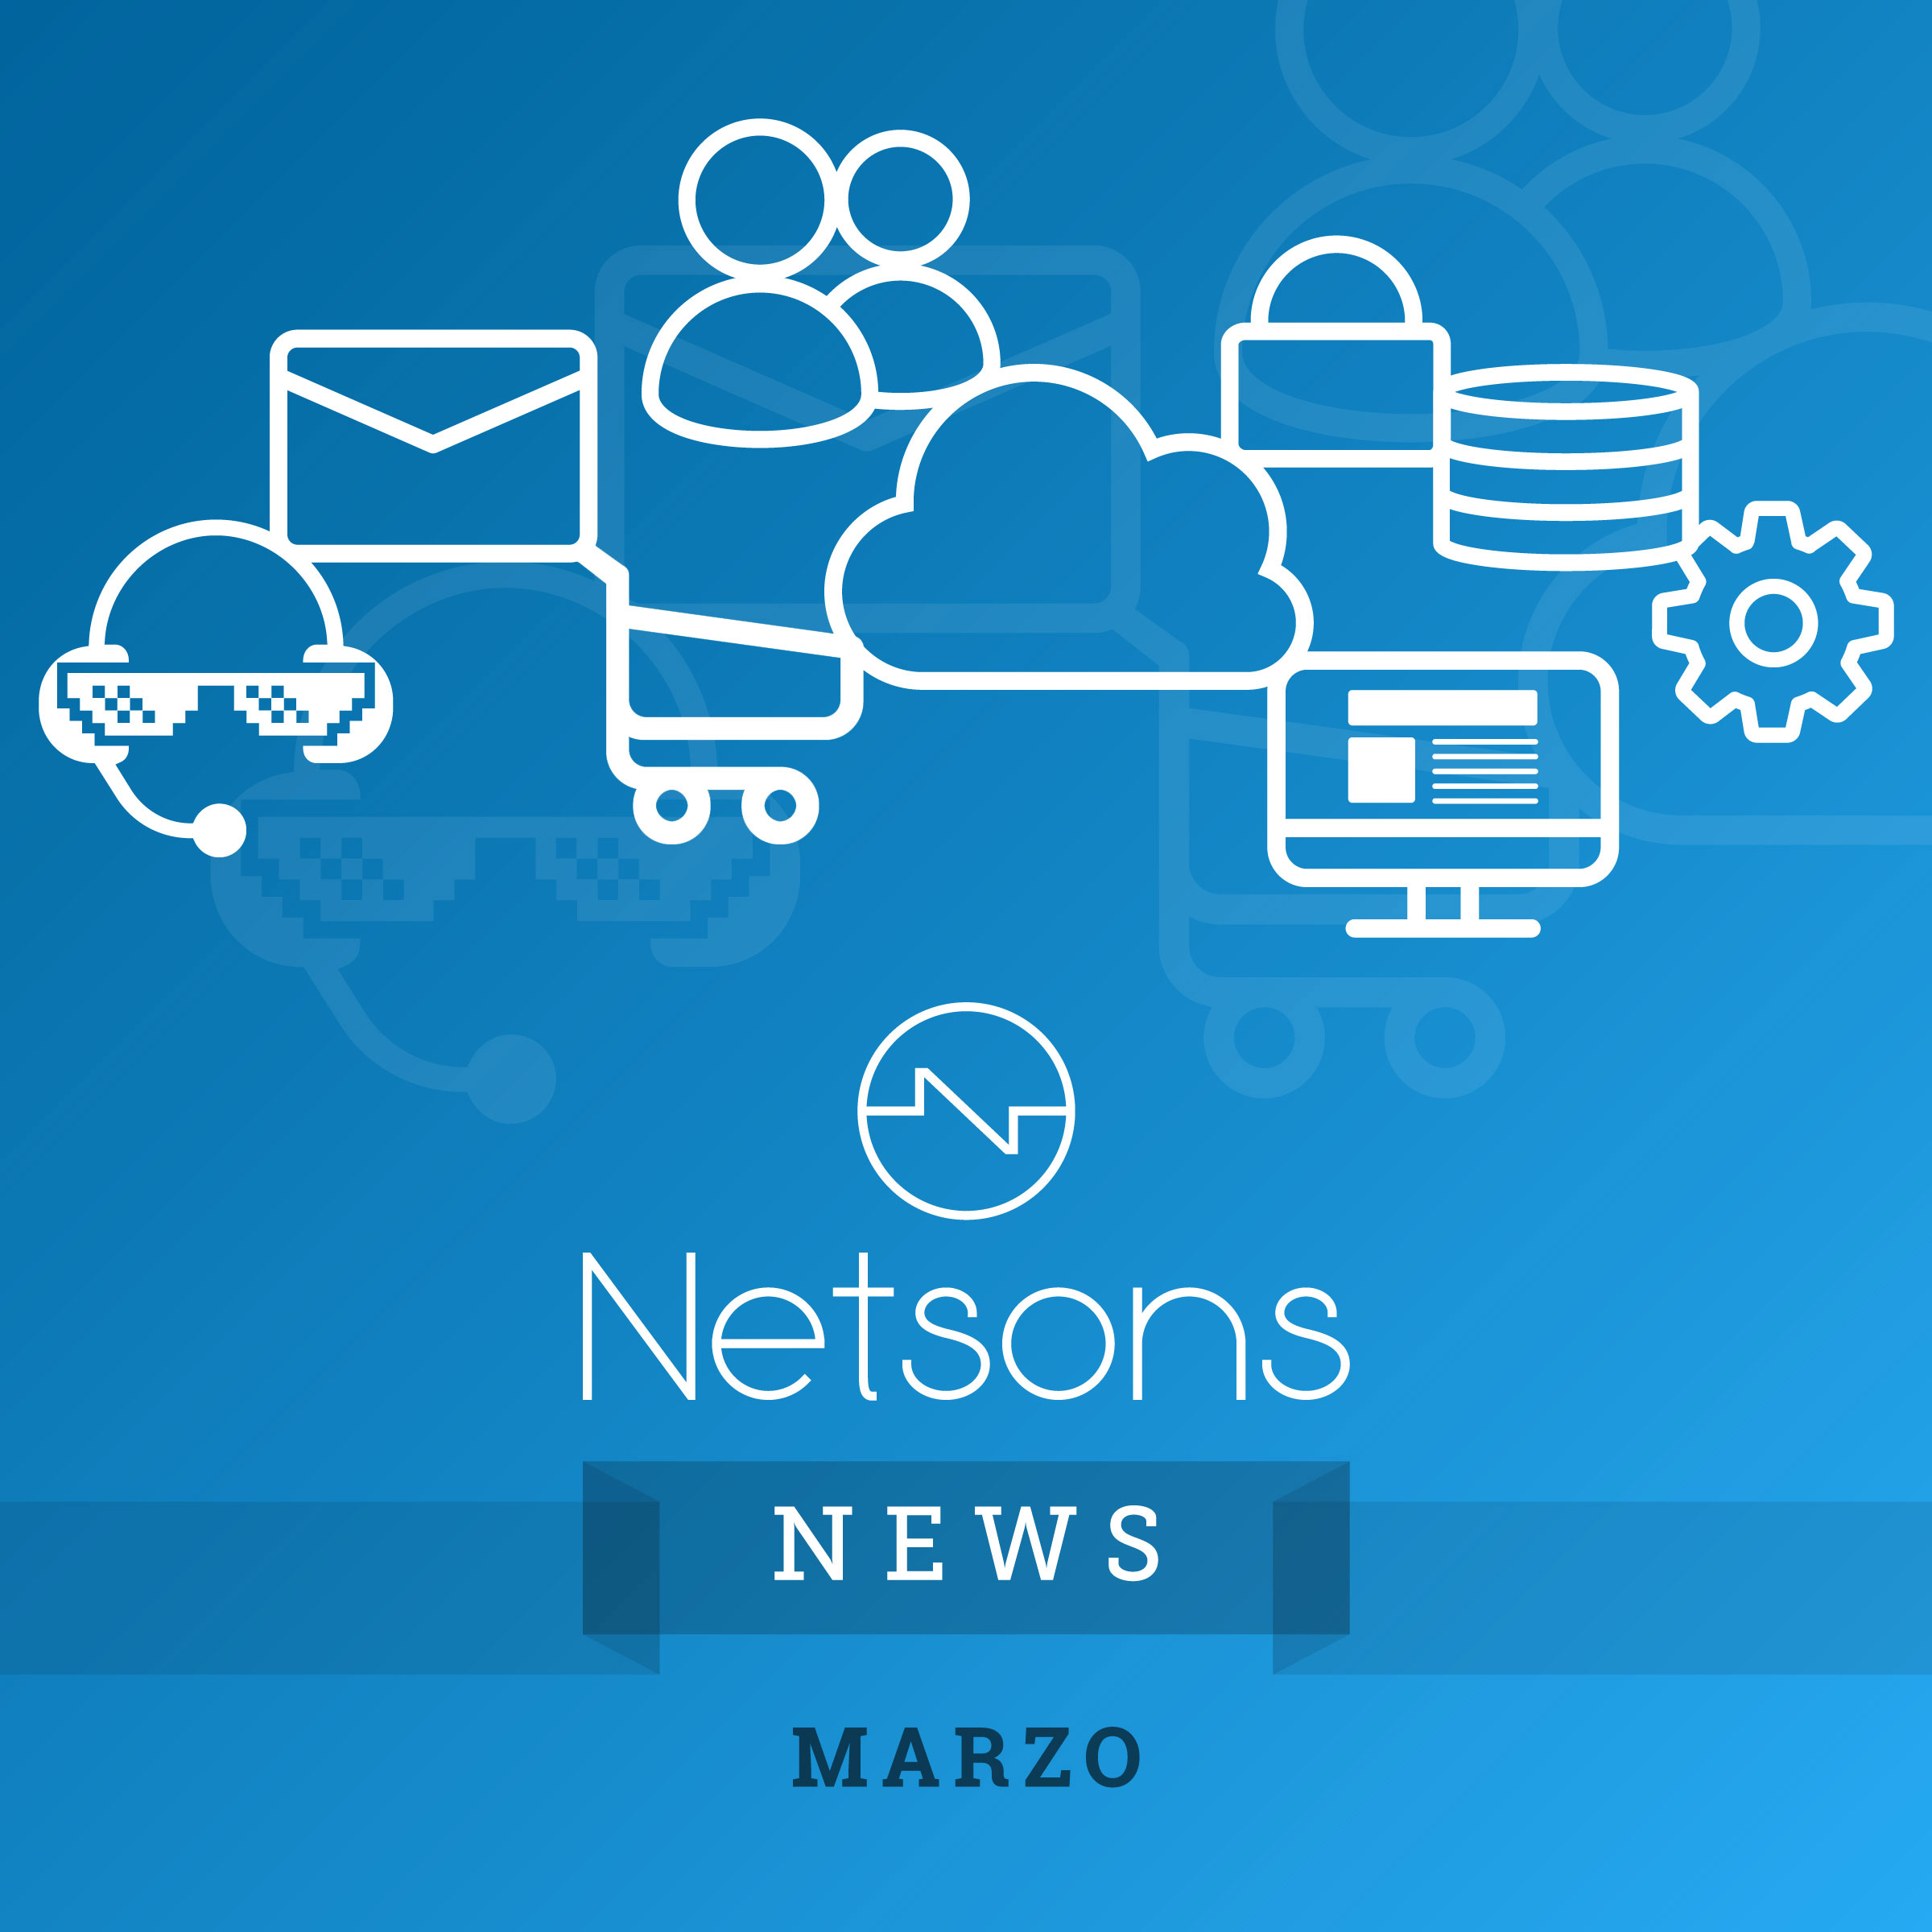 netsons news marzo